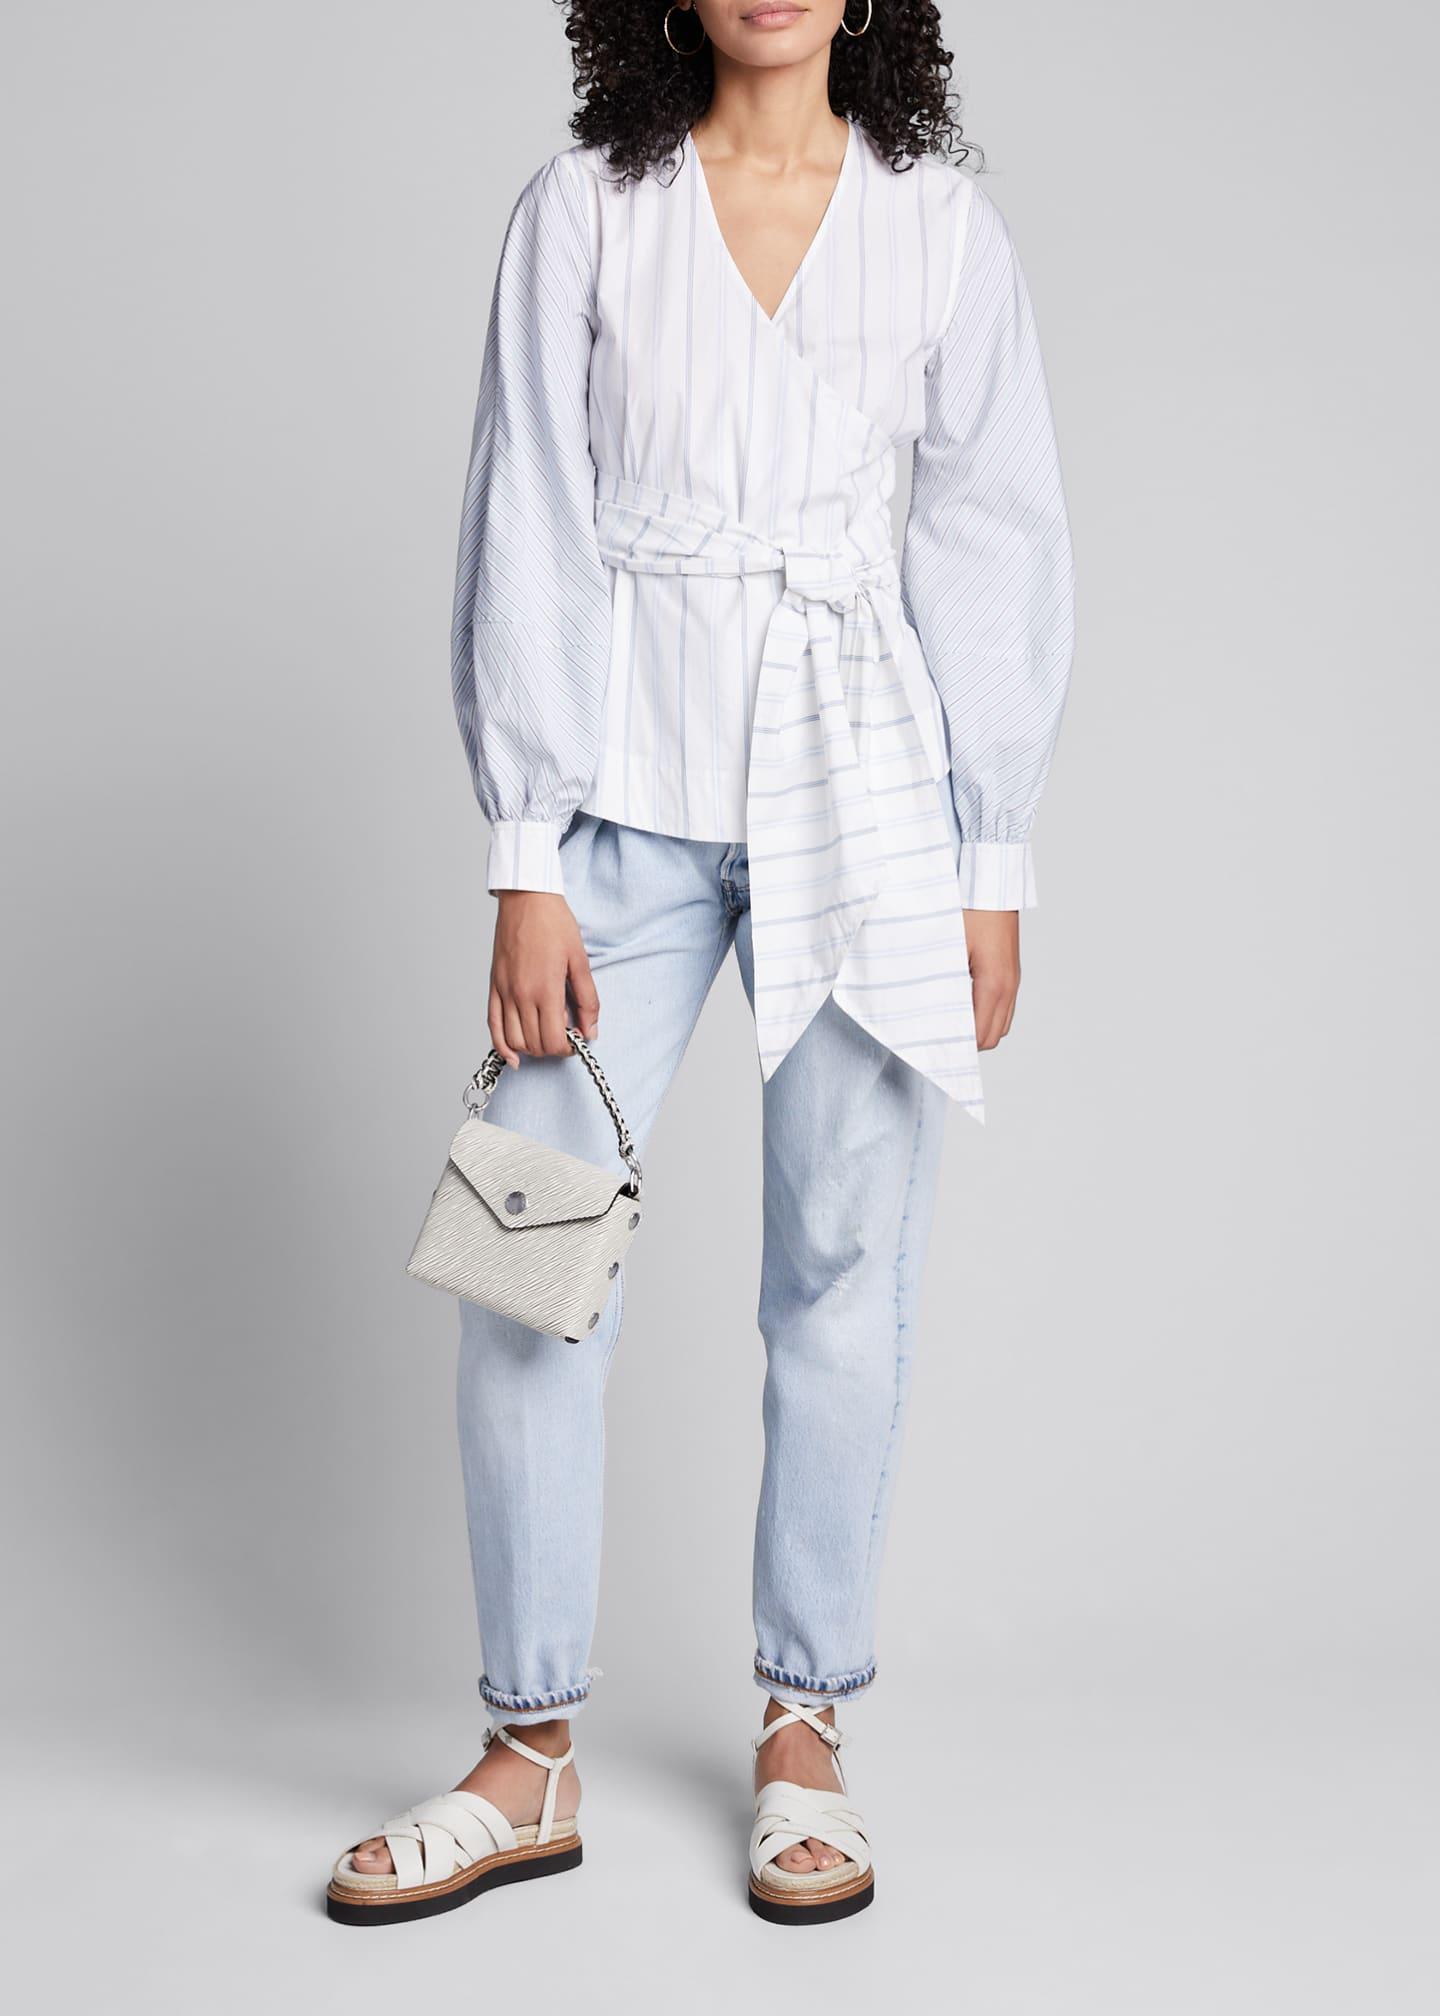 Ganni Striped Shirting Long-Sleeve Wrap Blouse